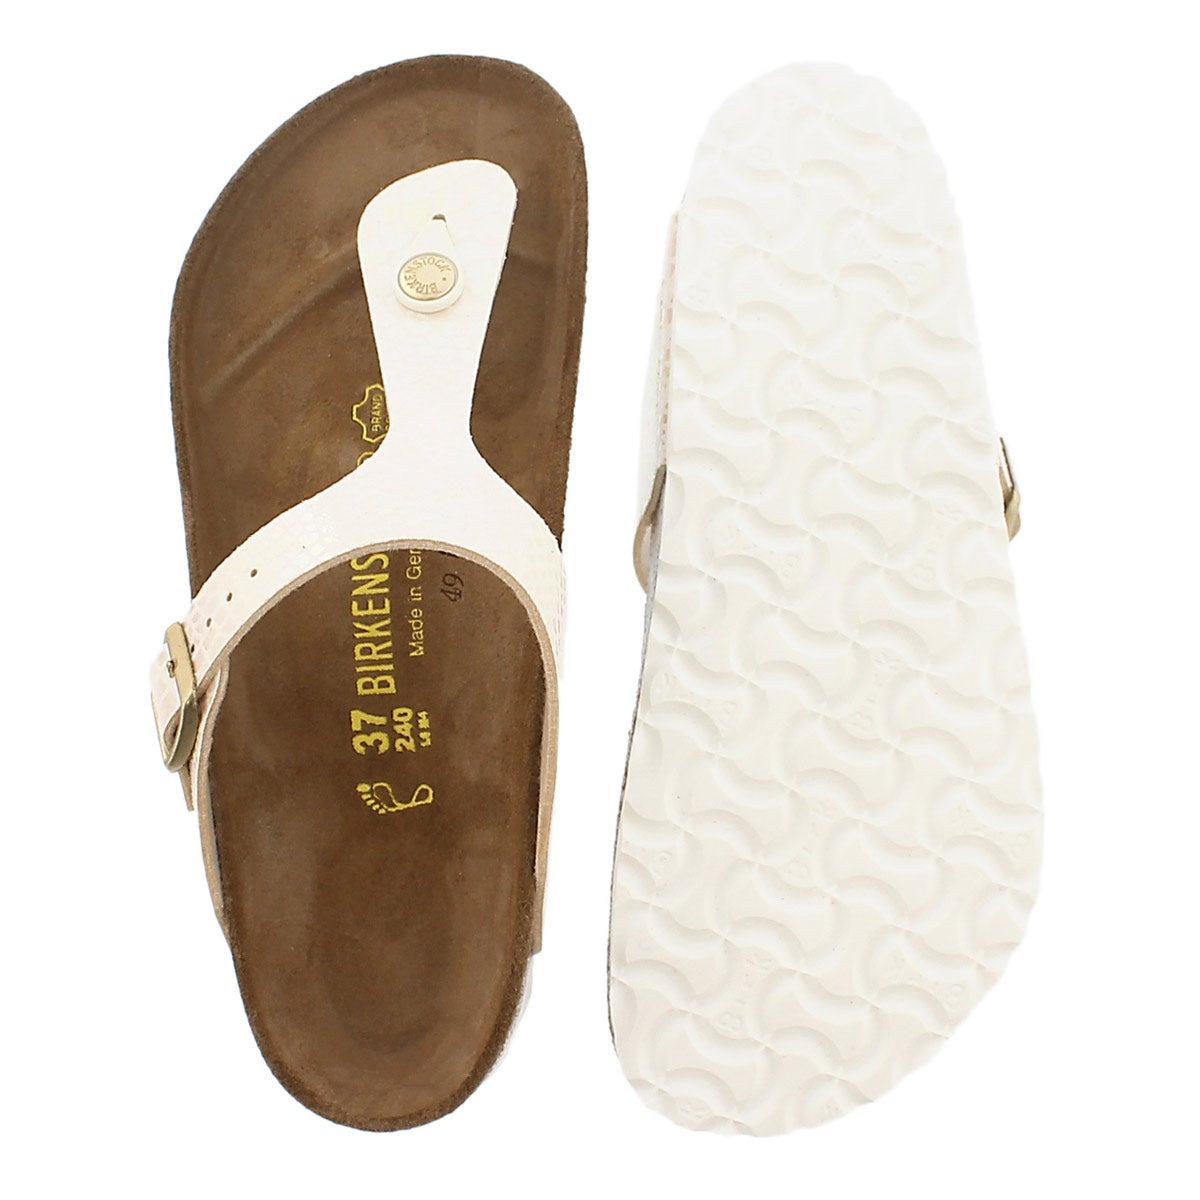 Lds Gizeh shinysnake crm BF thong sandal